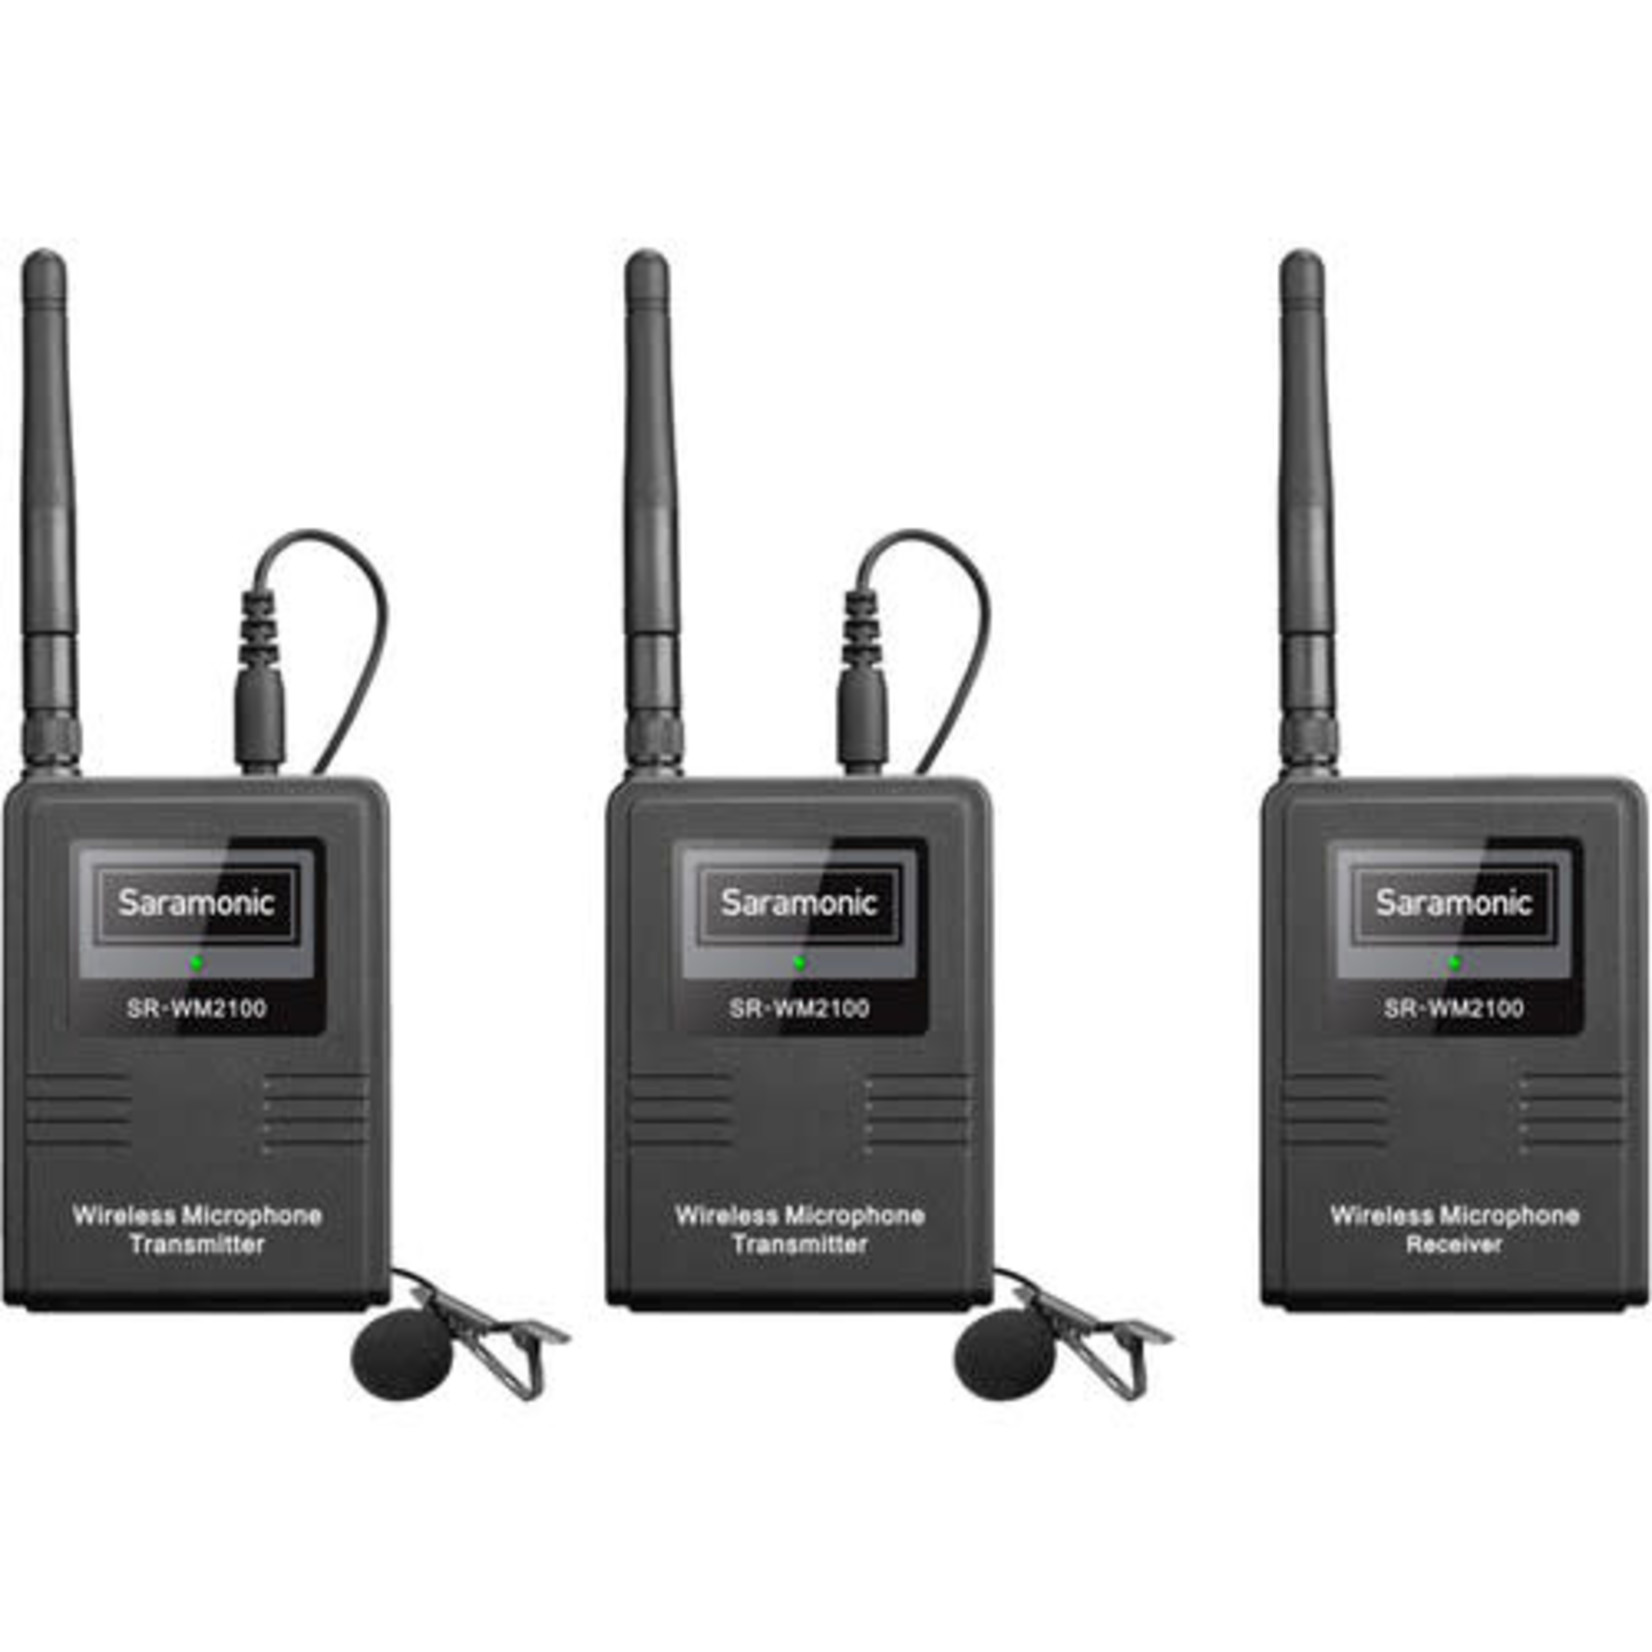 Saramonic Saramonic SR-WM2100 2-Person Camera-Mount Digital Wireless Omni Lavalier Microphone System for Cameras and Smartphones (2.4 GHz)